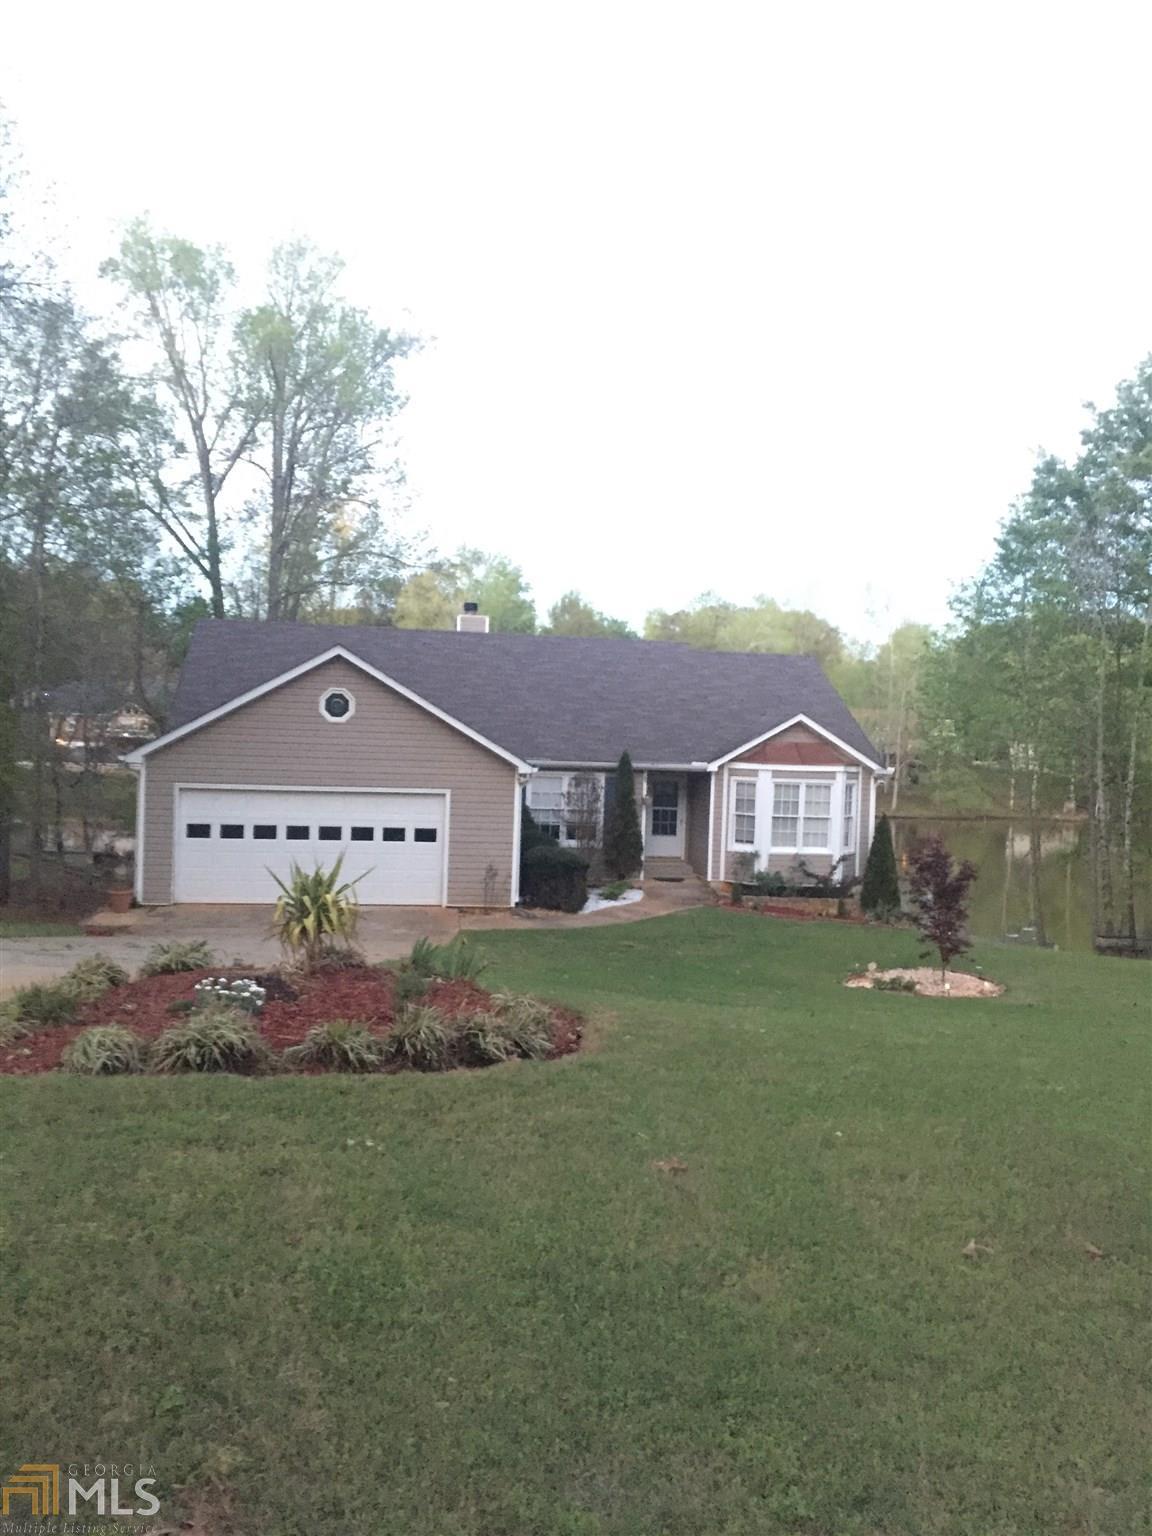 Dujuan Mosely Of Better Homes And Gardens Real Estate Metro Brokers In Atlanta Ga